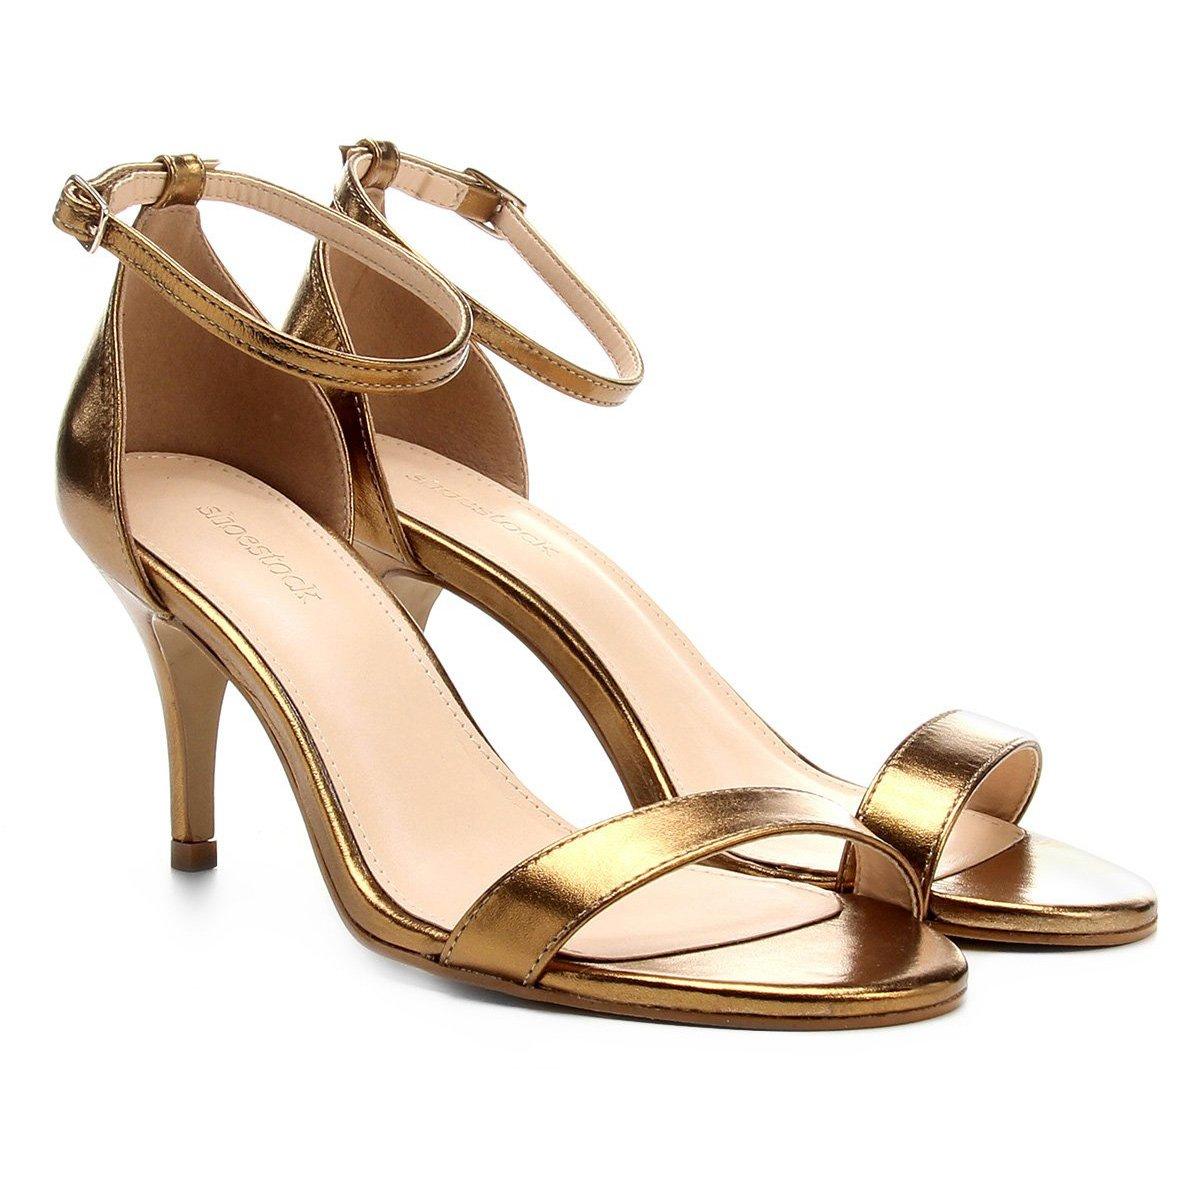 4e3fa8d1b Sandália Couro Shoestock Salto Fino Metalizada Feminina